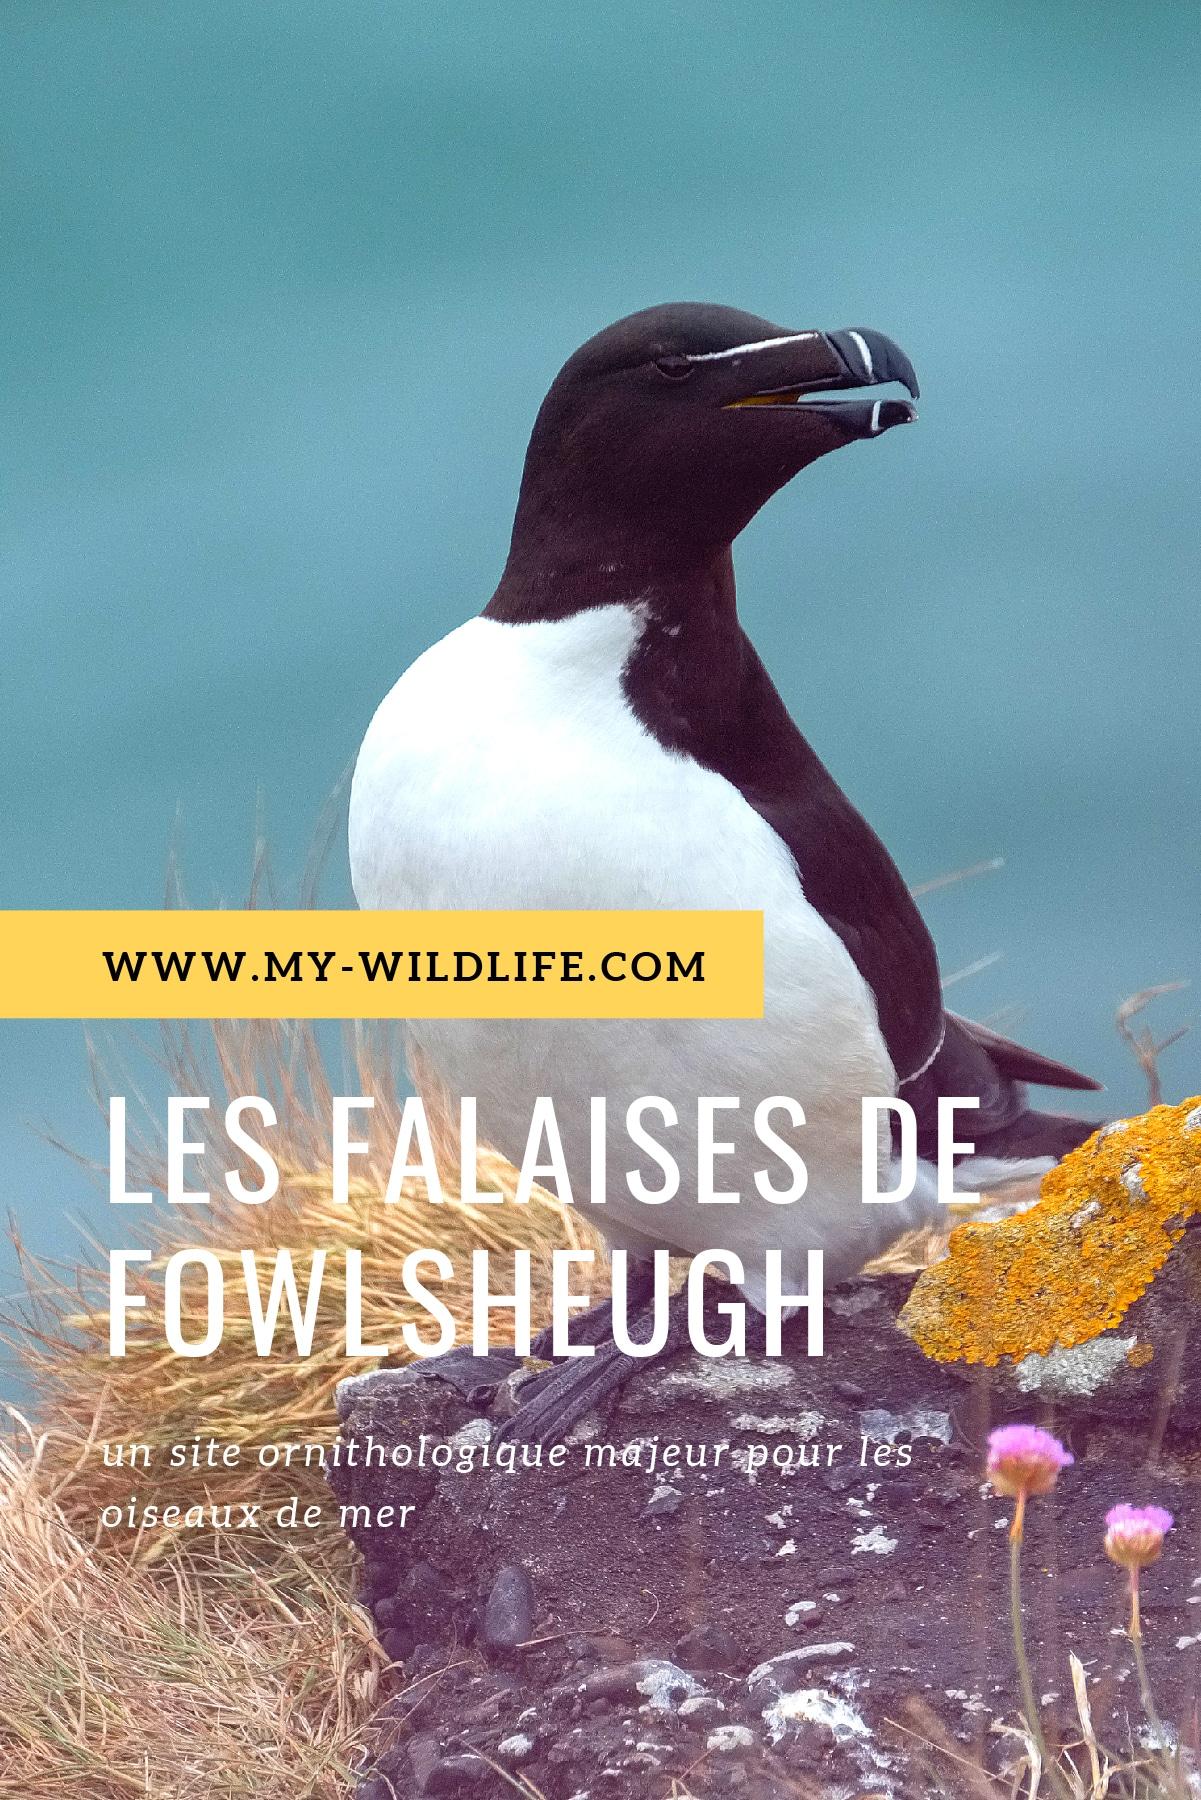 Fowlsheugh-01